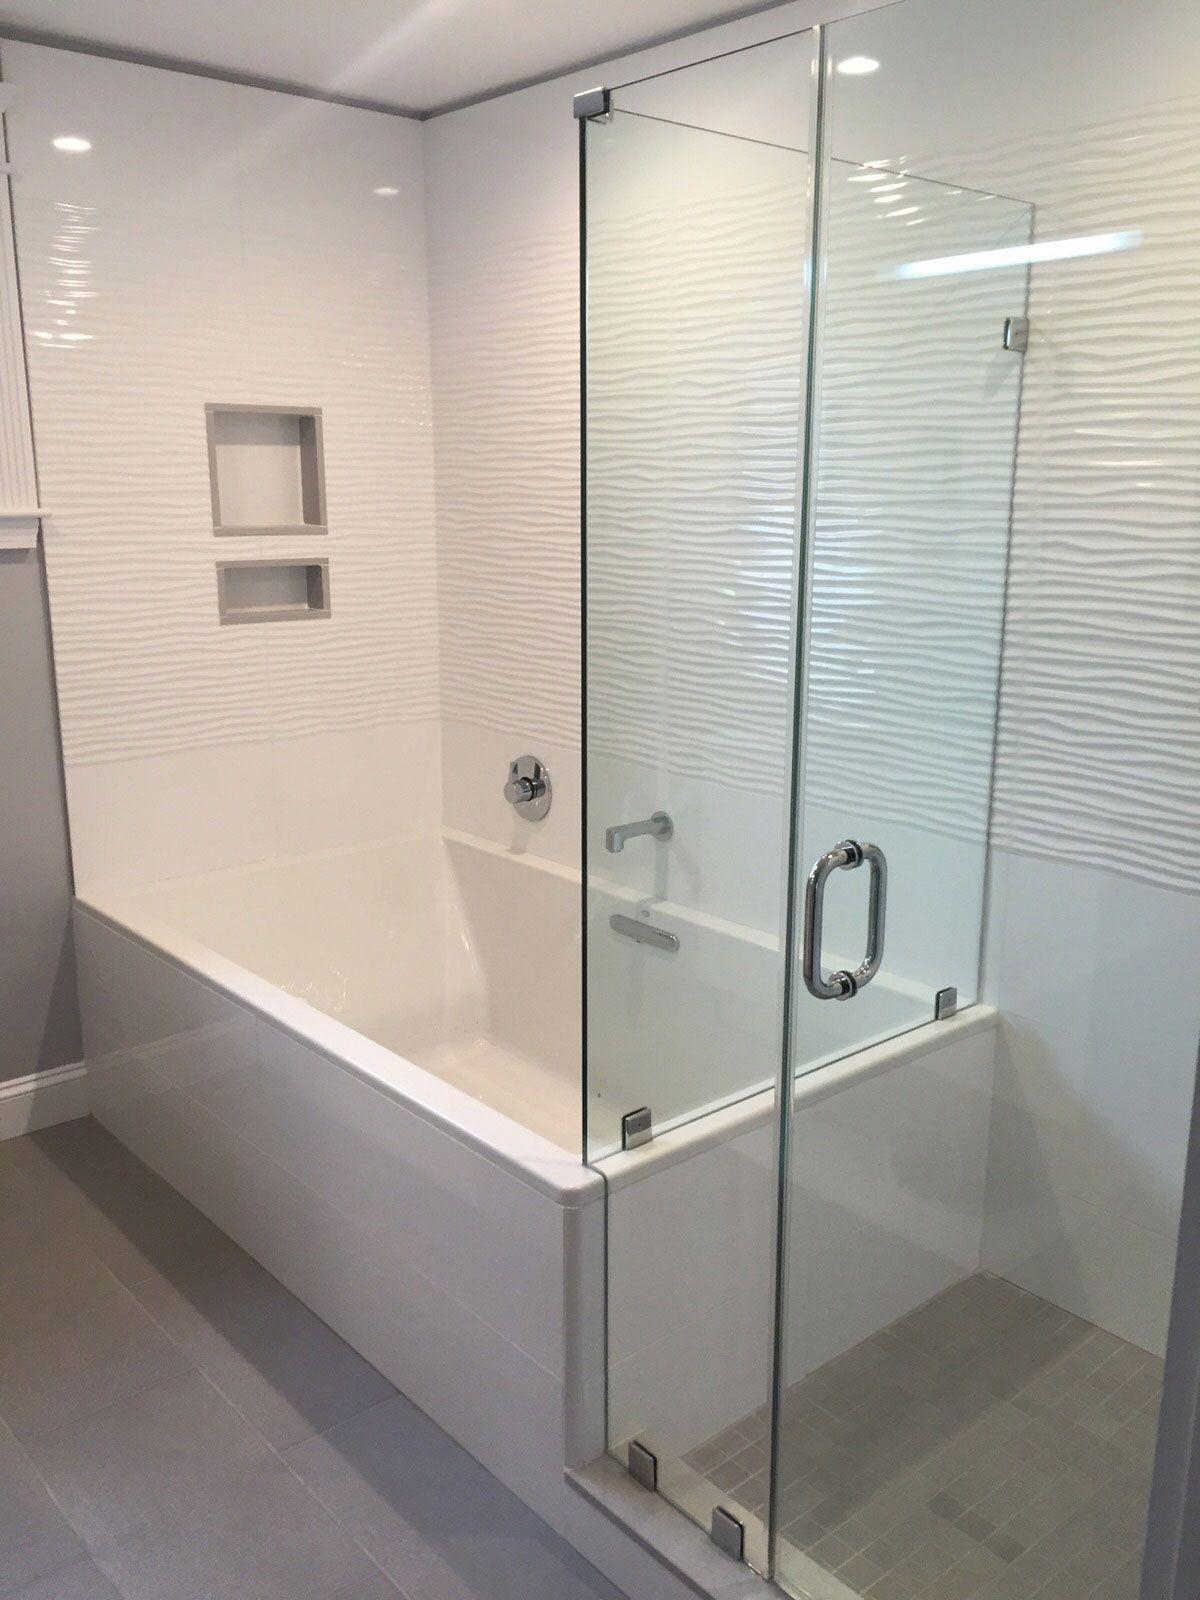 Shower With White Wavy Porcelain Tile Google Search Shower Tile Bathroom Shower Tile White Tile Shower